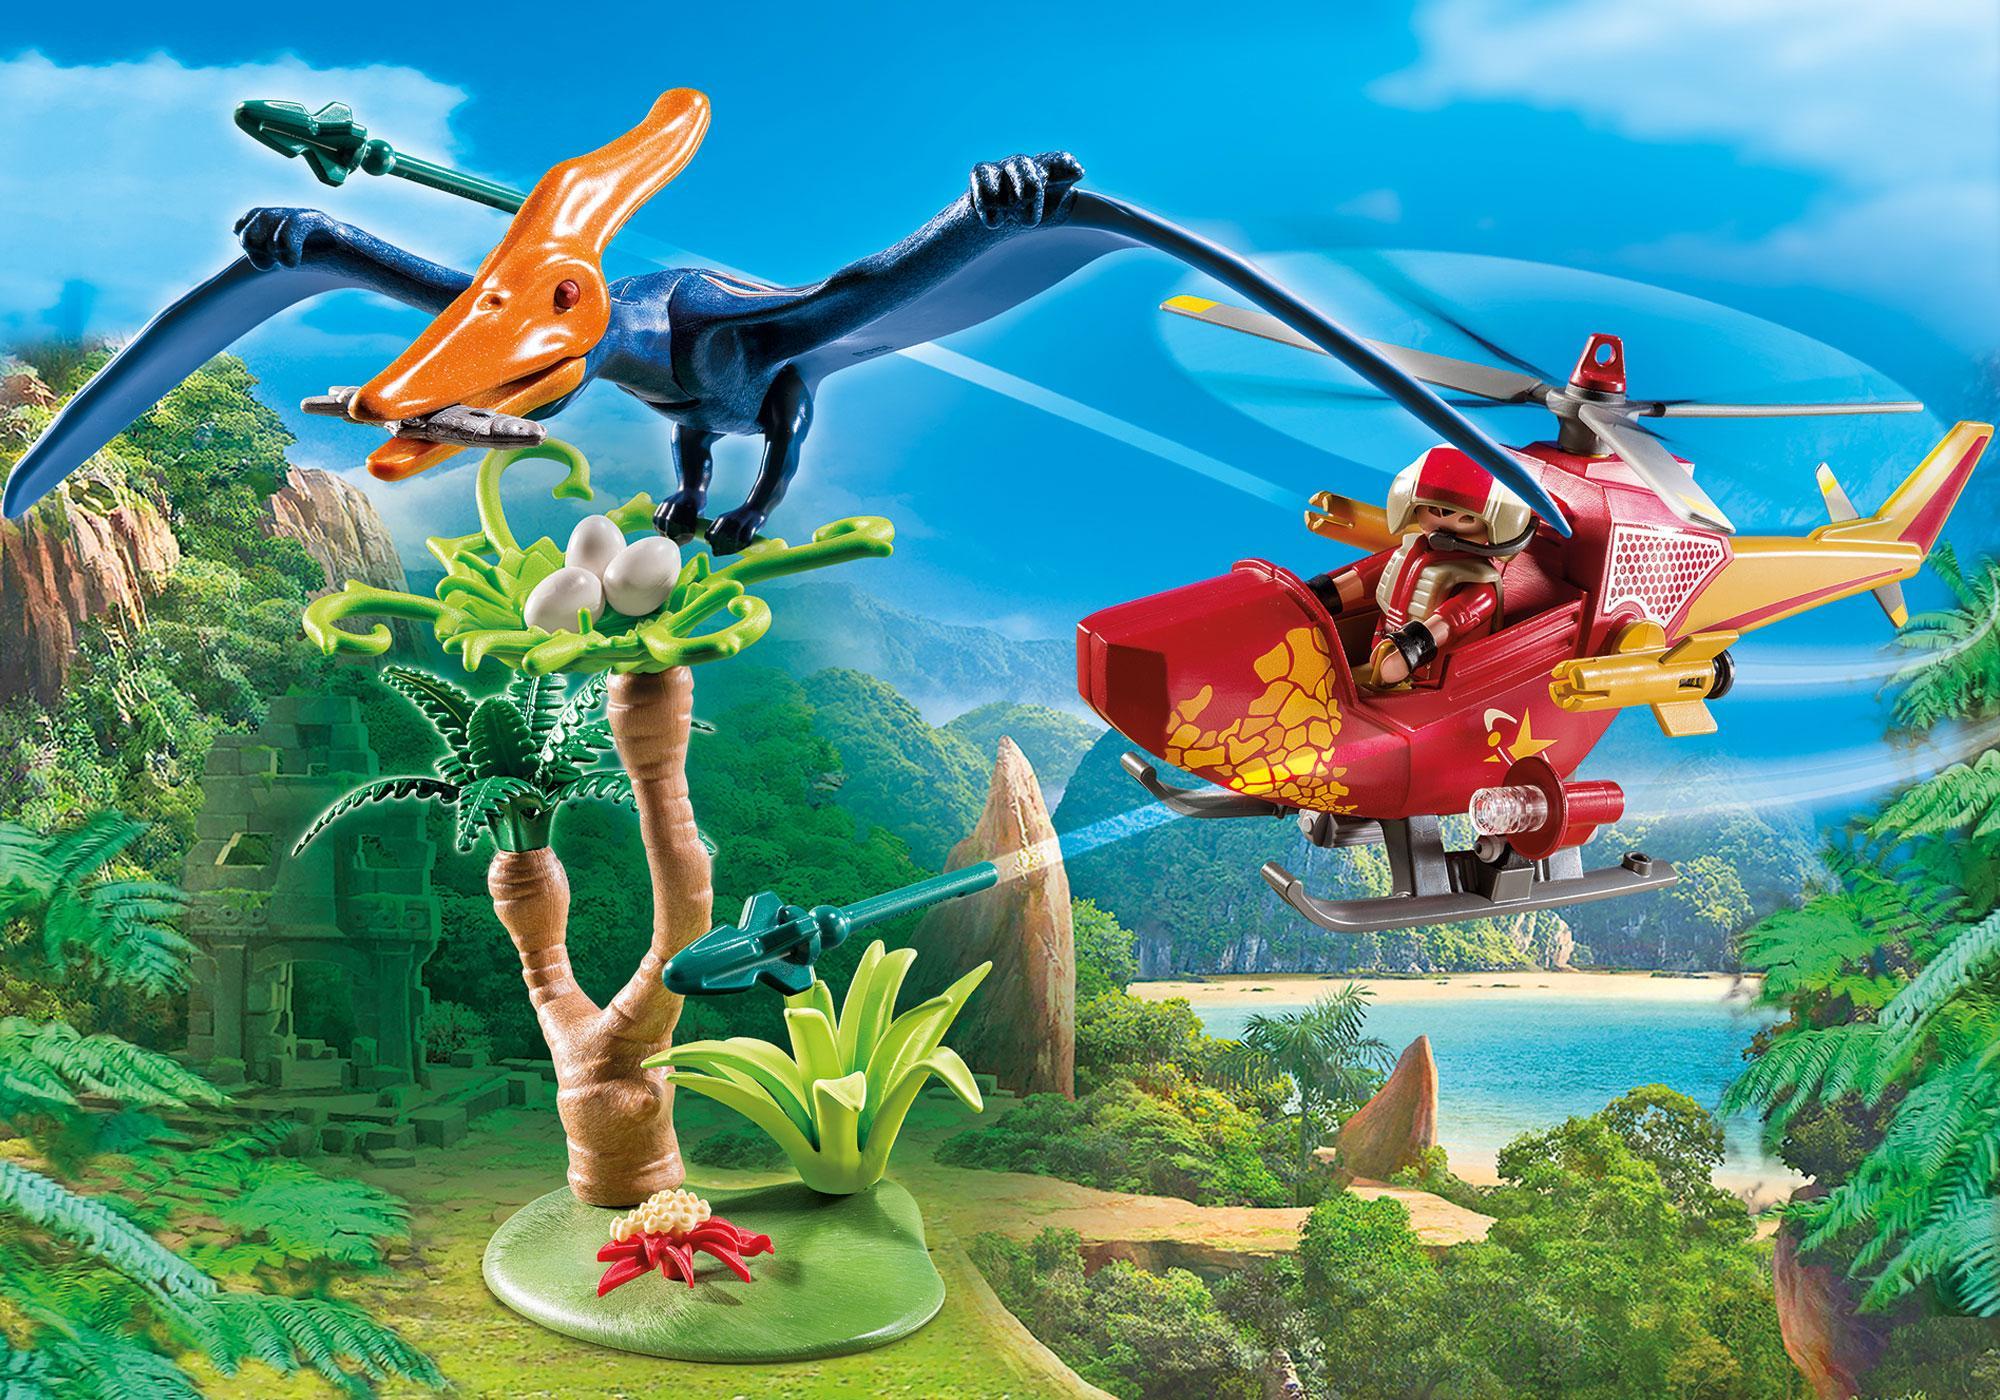 http://media.playmobil.com/i/playmobil/9430_product_detail/Helikopter mit Flugsaurier